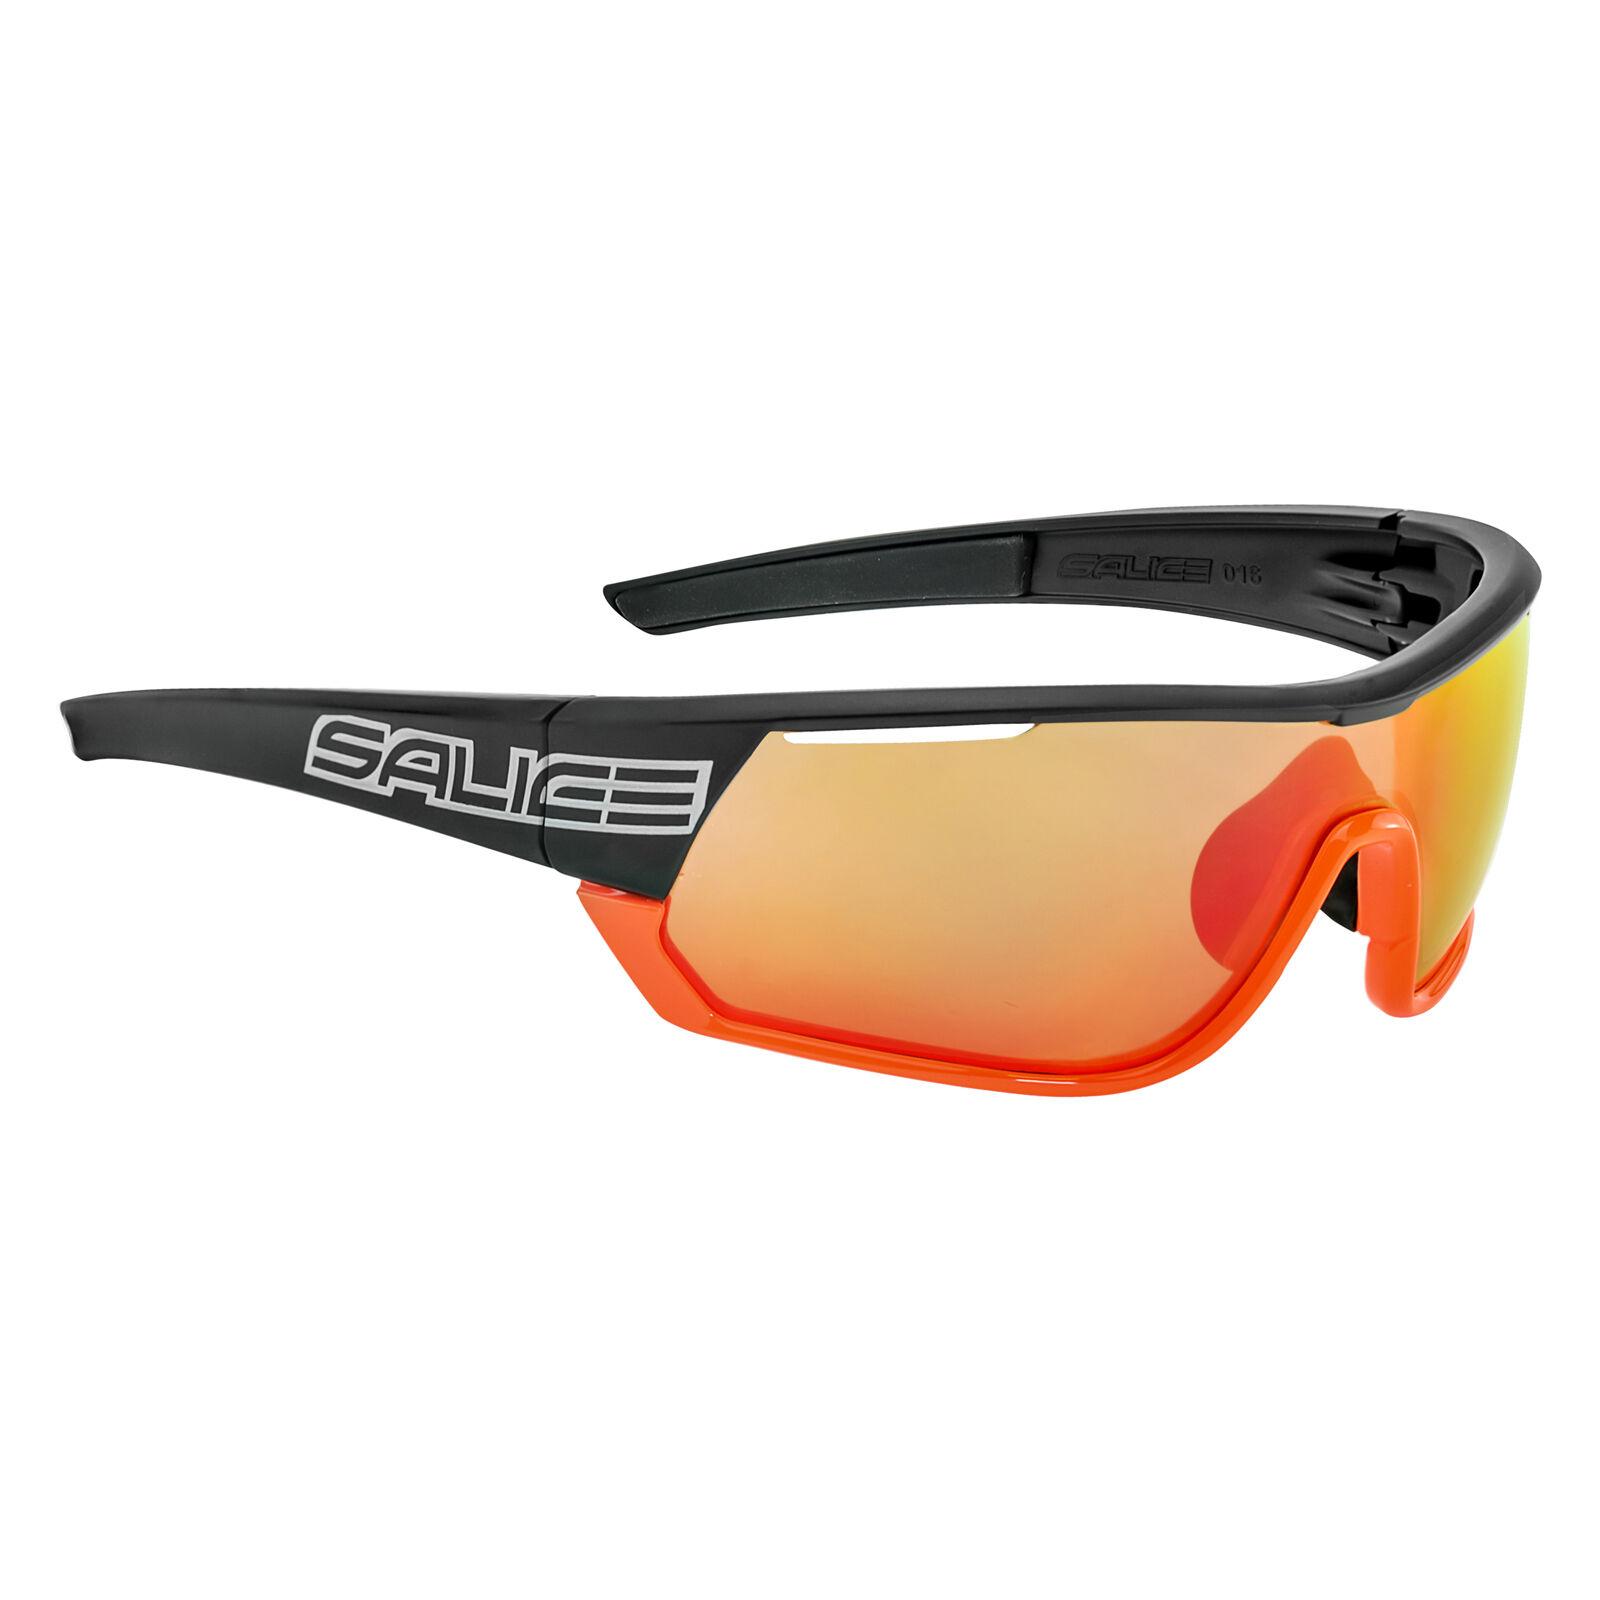 Salice 016 RW Mirror Sunglasses - Green/Blue